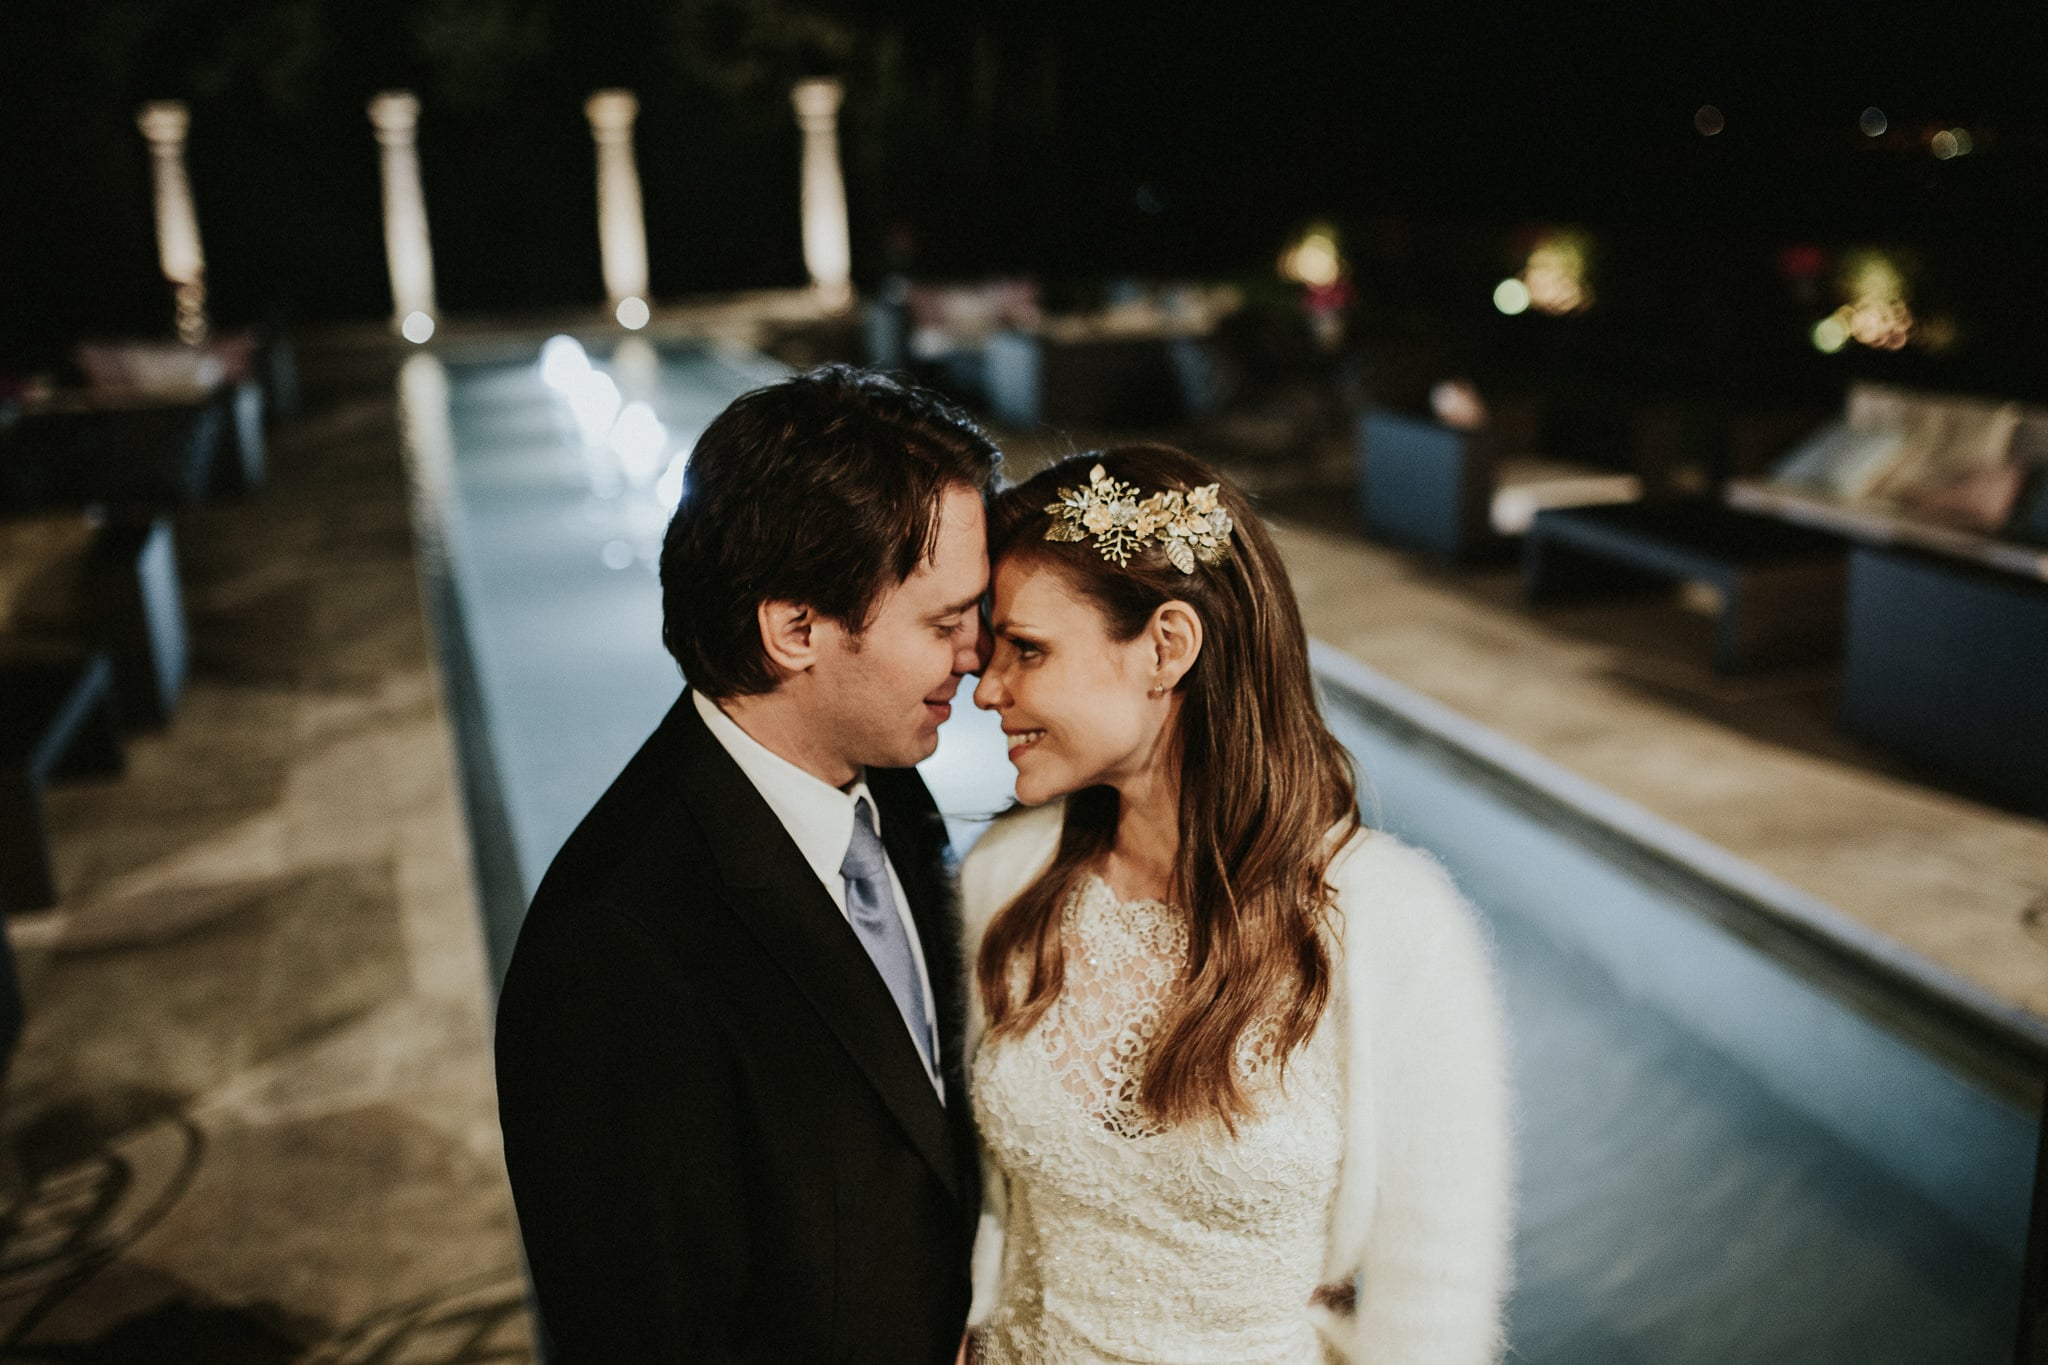 Fotografo-bodas-Cigarral-de-las-Mercedes-140